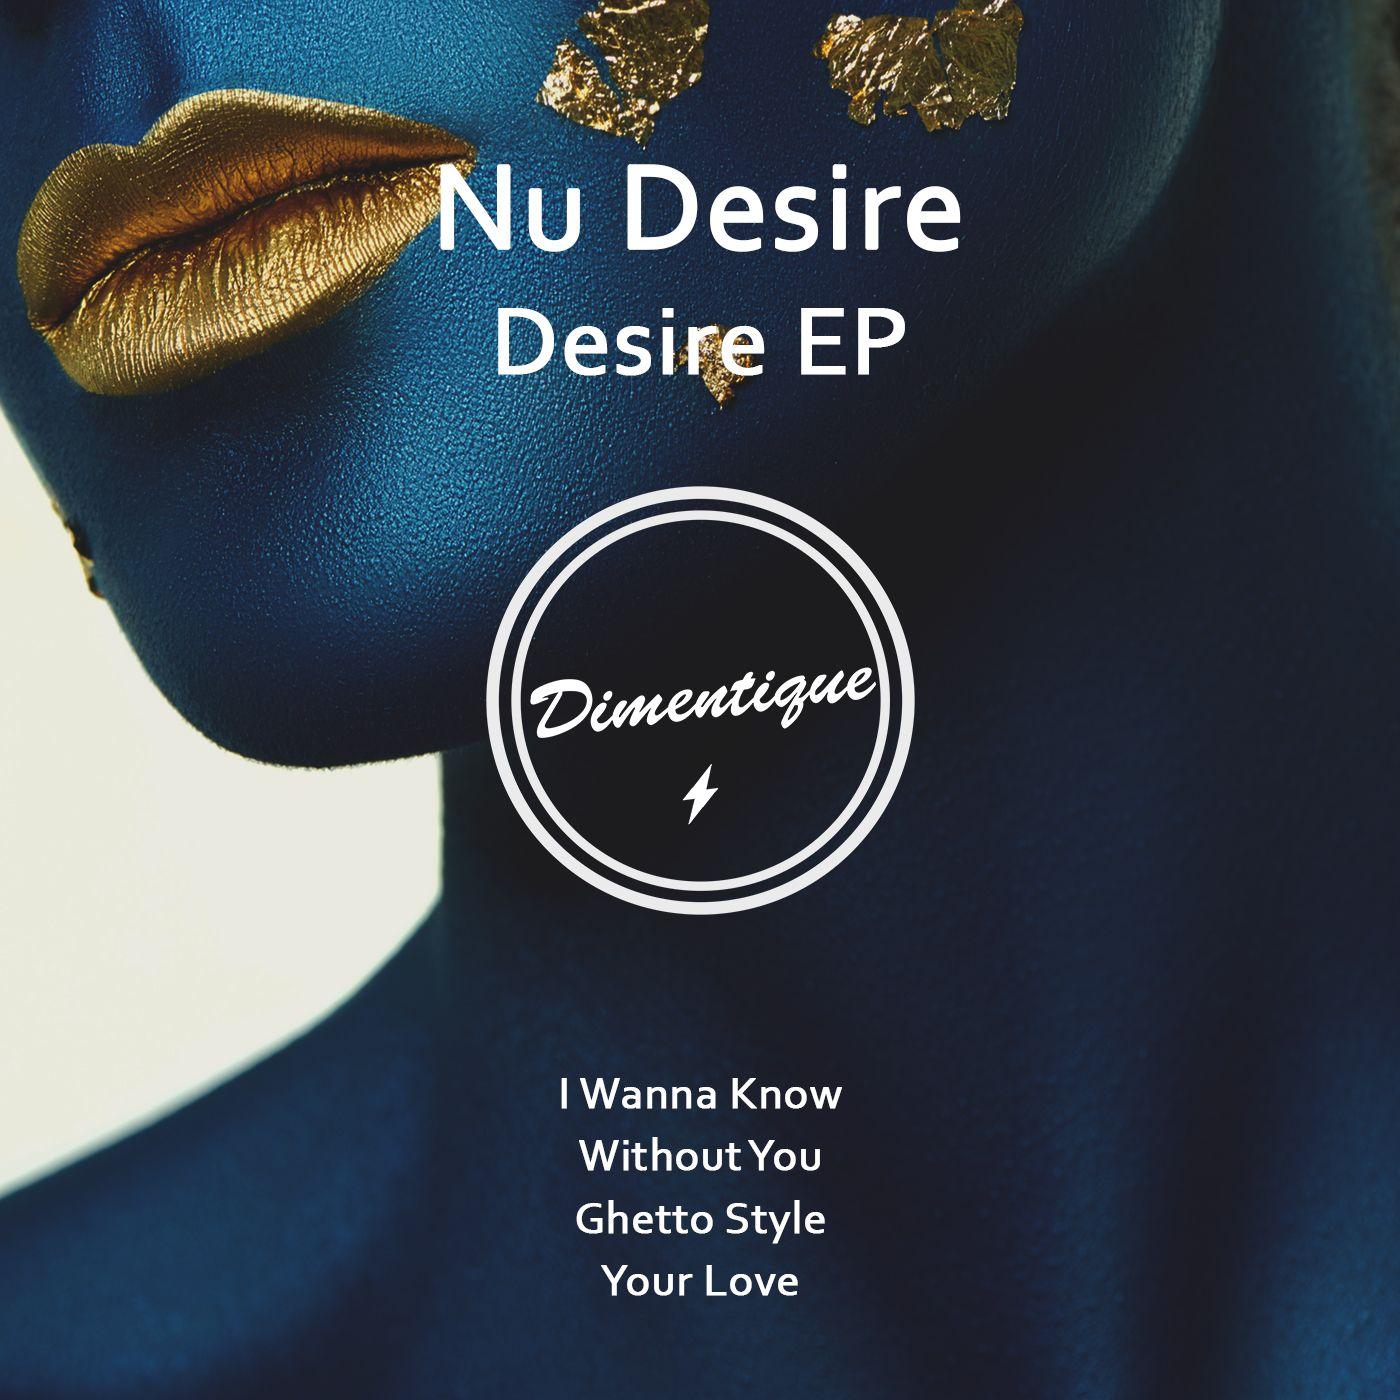 dimentique_new_art_2016_nu_desire_desire_ep.jpg